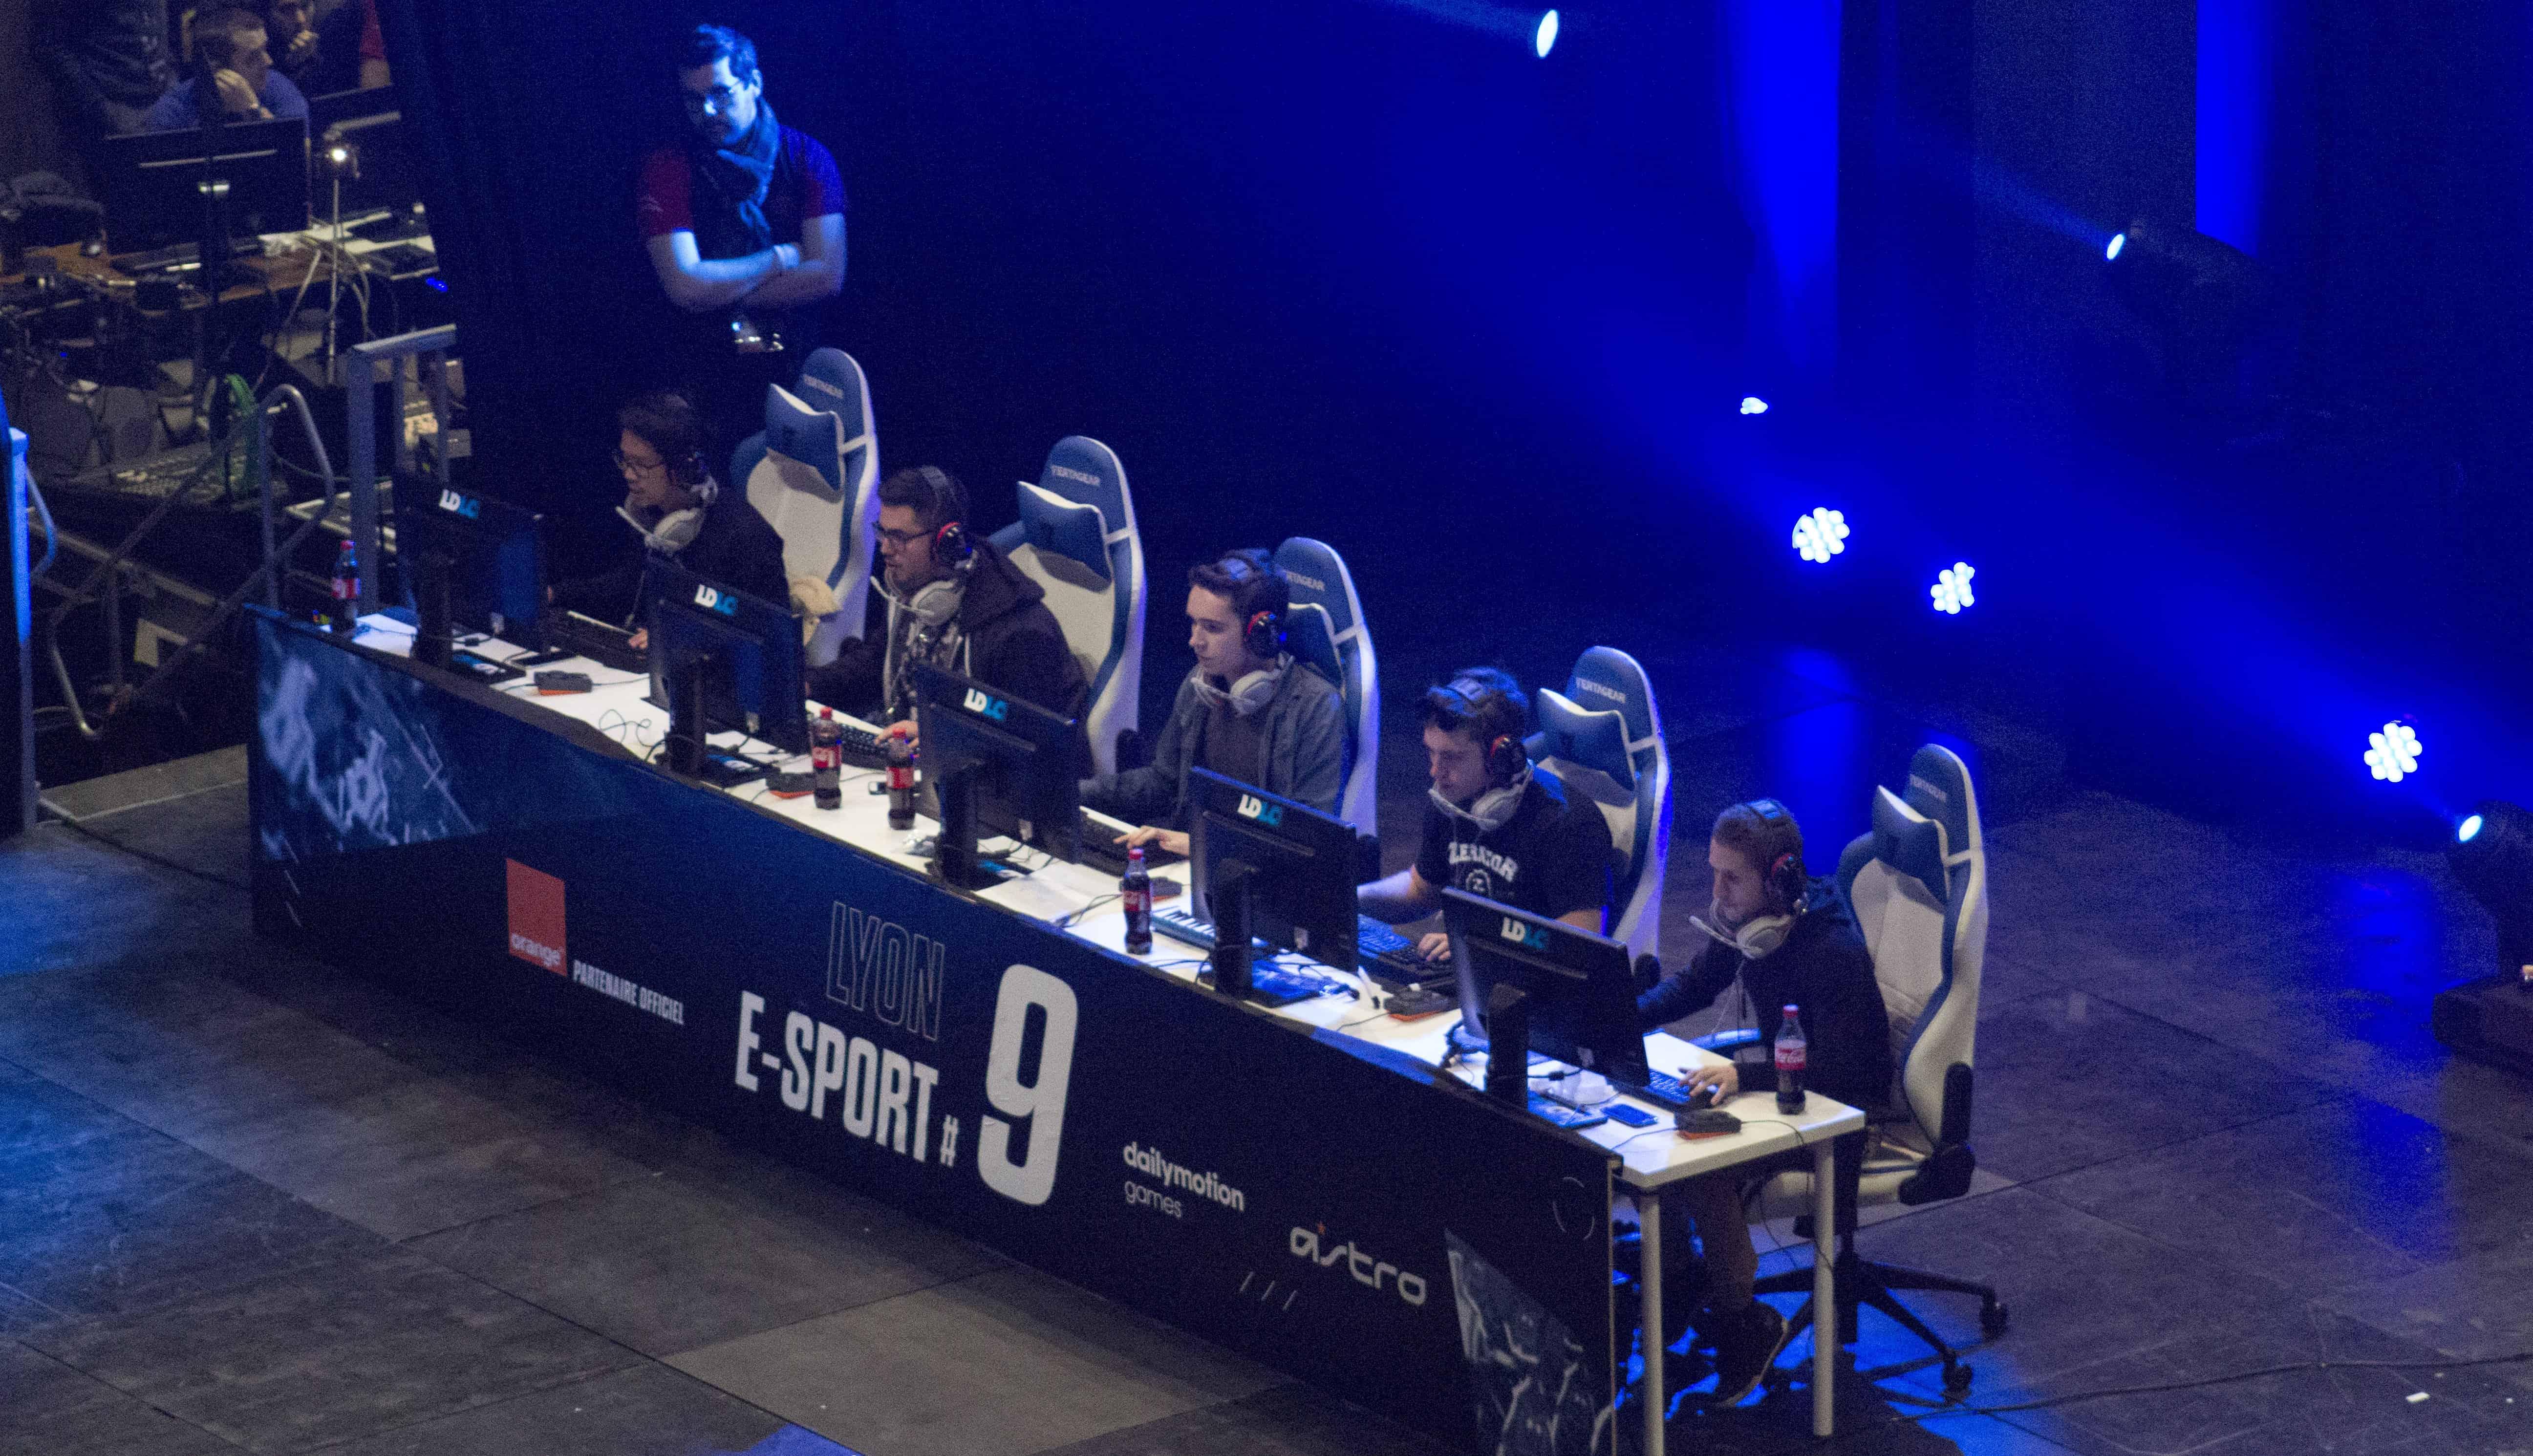 Lyon_Esport_9_-_Team_Indy_Spensable_(side)